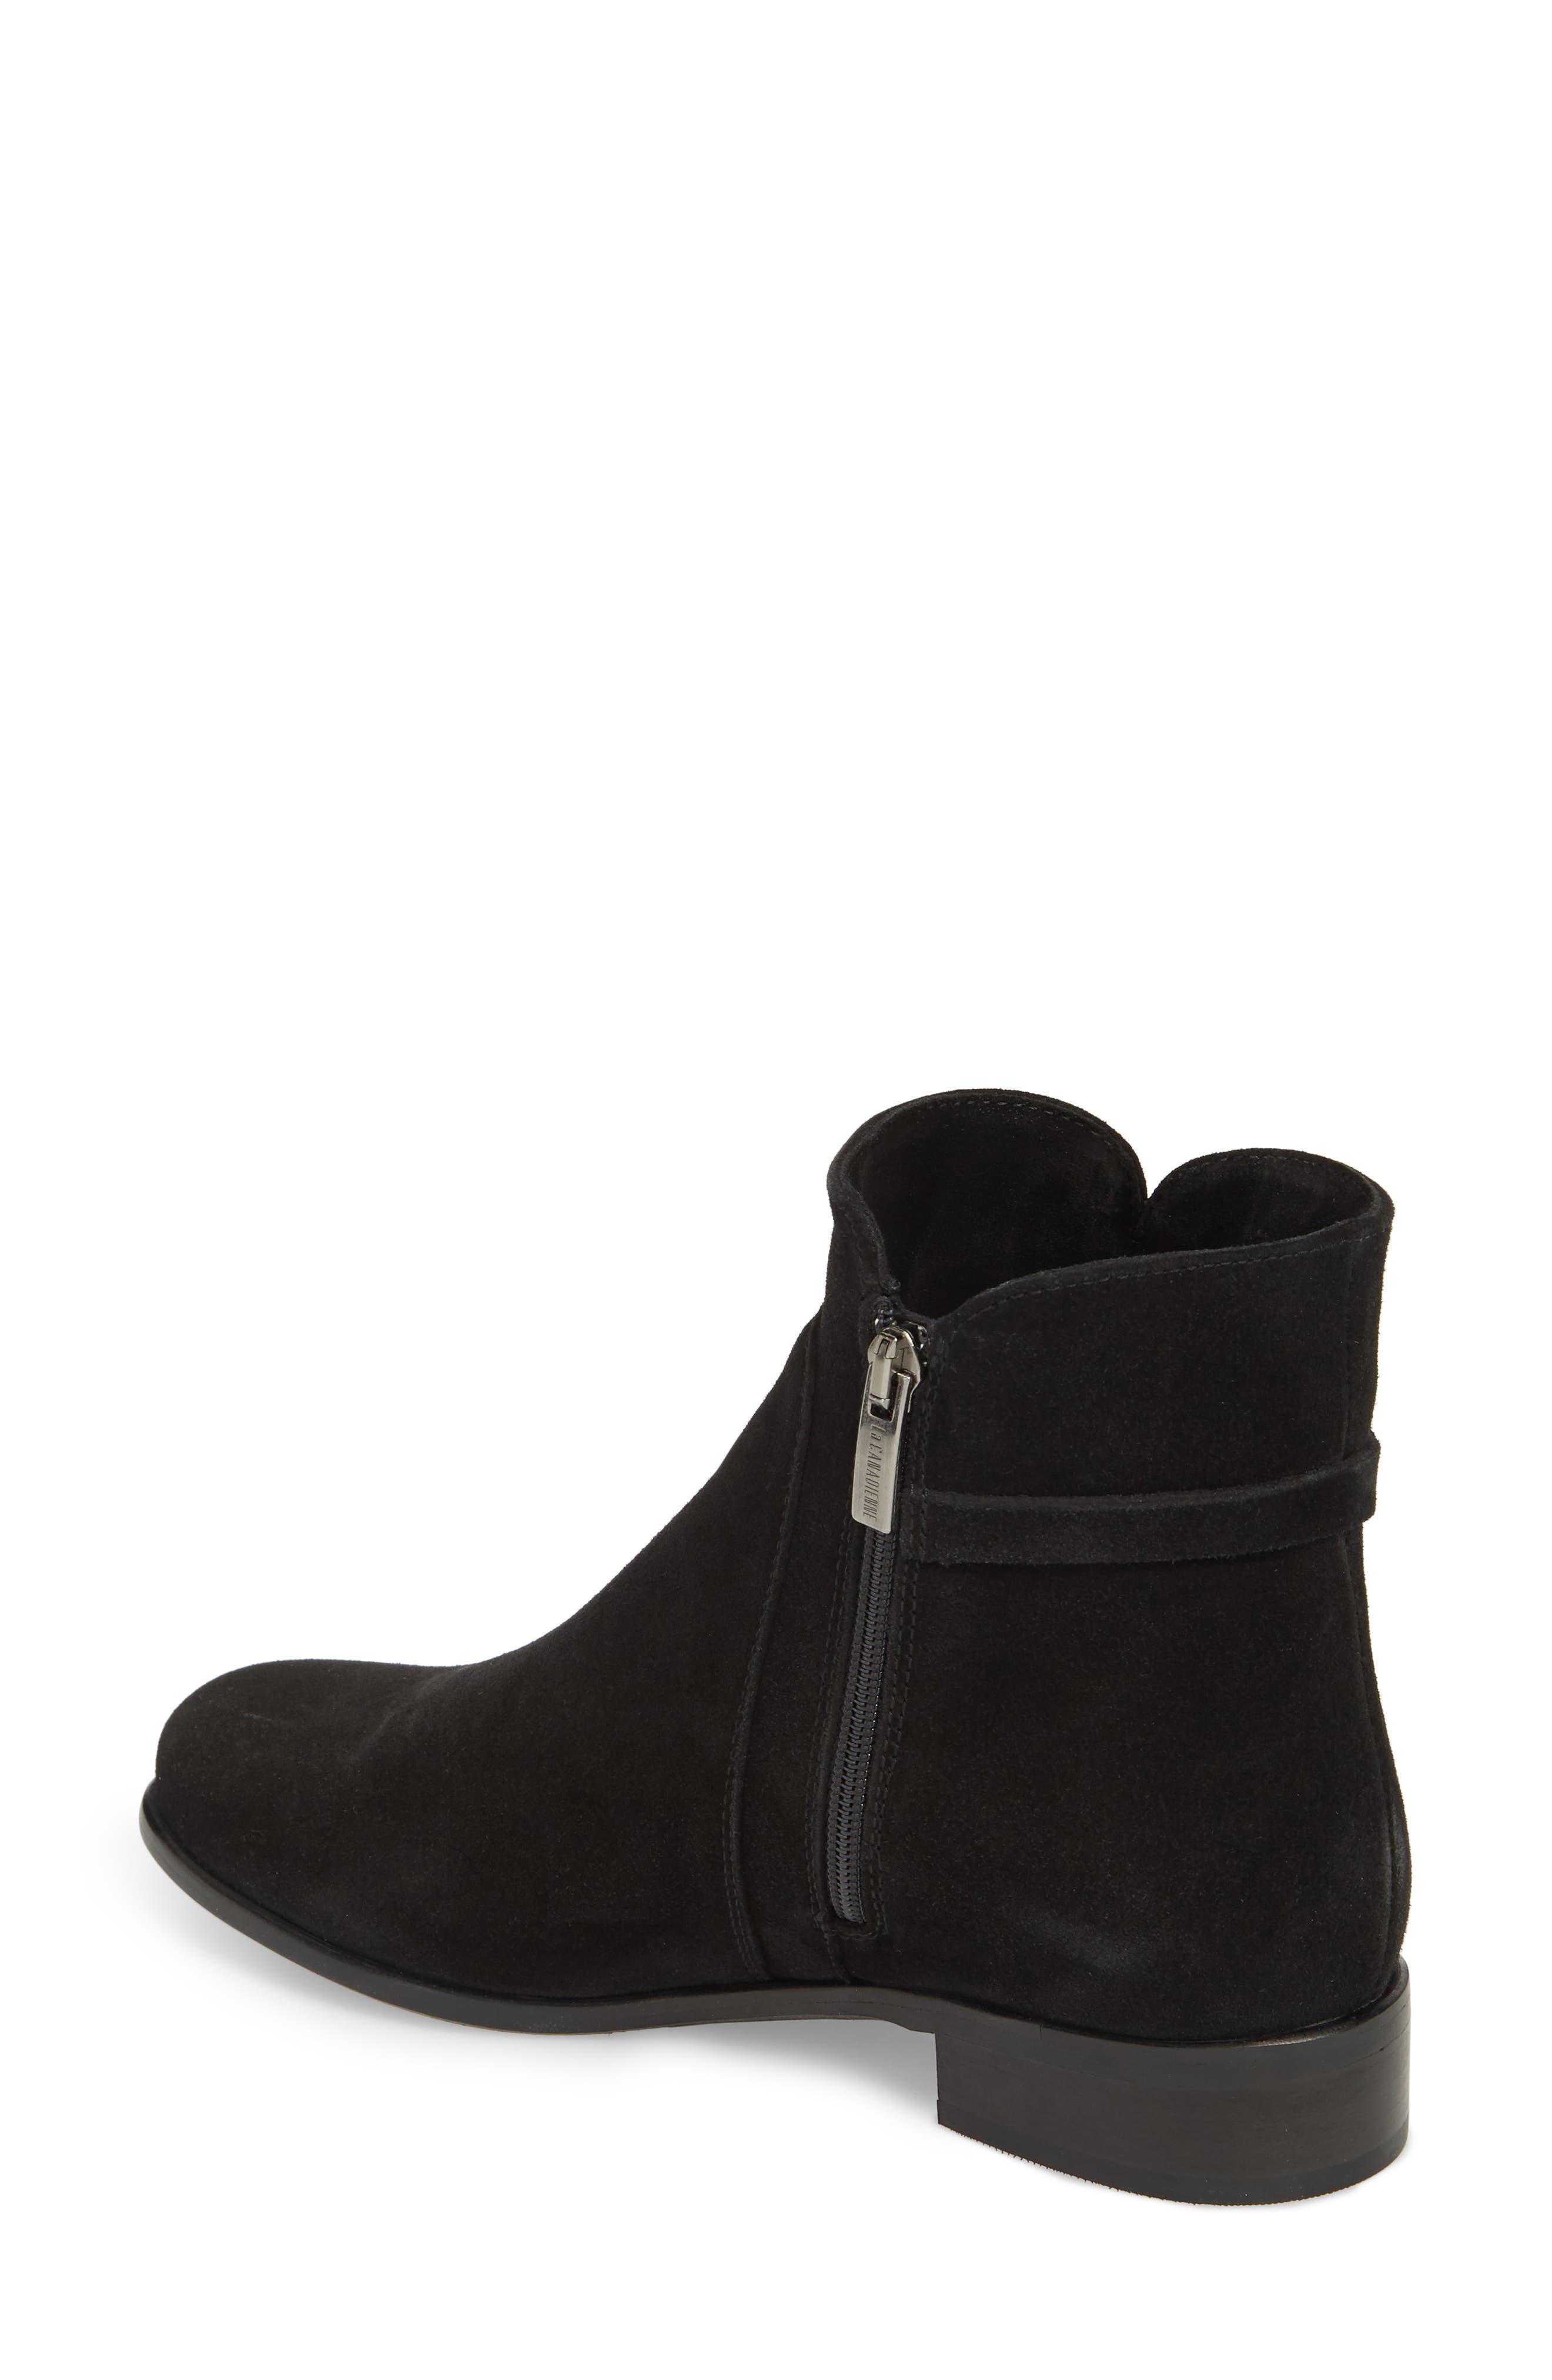 Sicilia Waterproof Boot,                             Alternate thumbnail 2, color,                             Black Suede